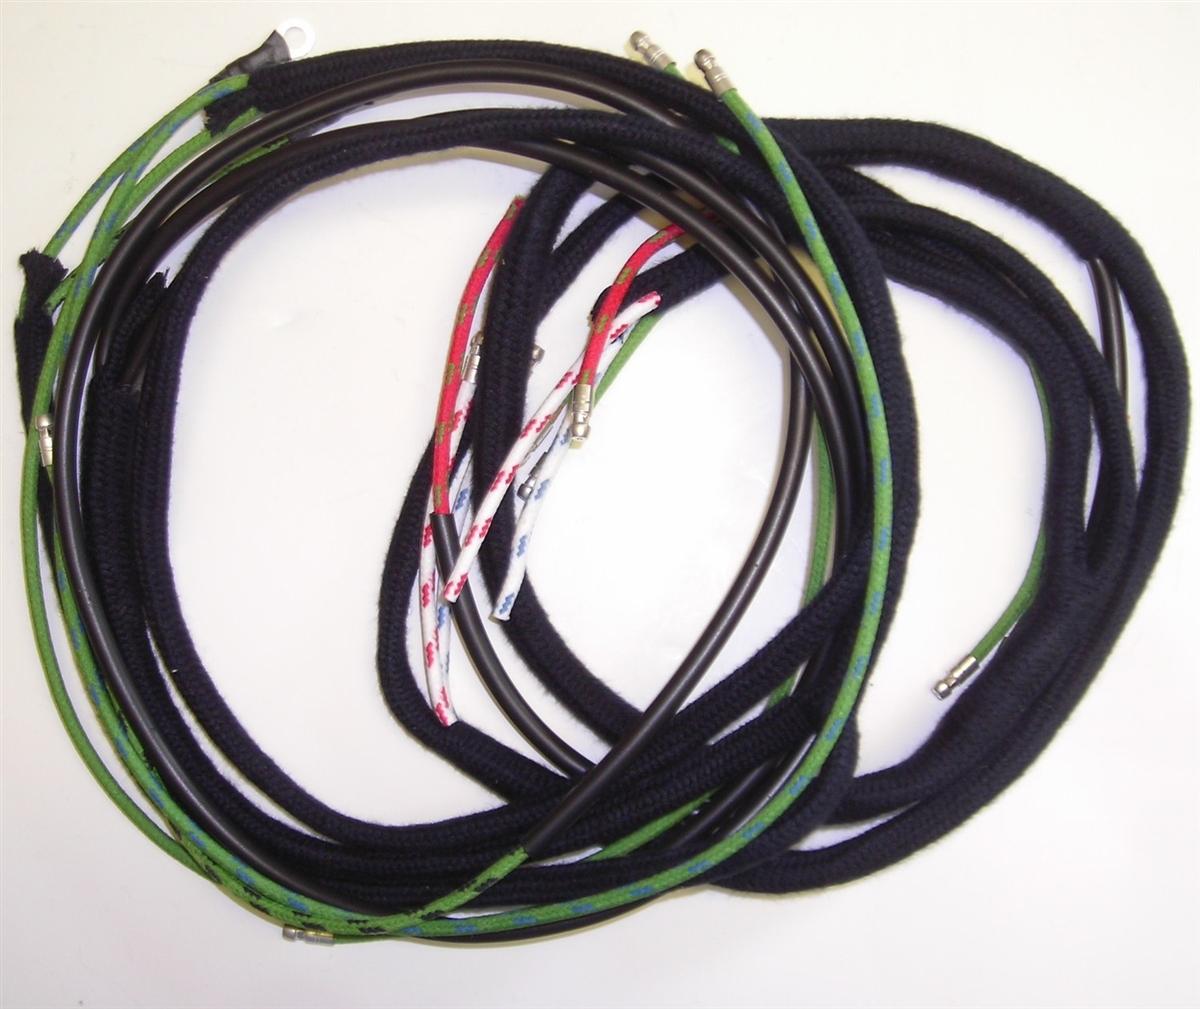 57 jaguar wiring harness